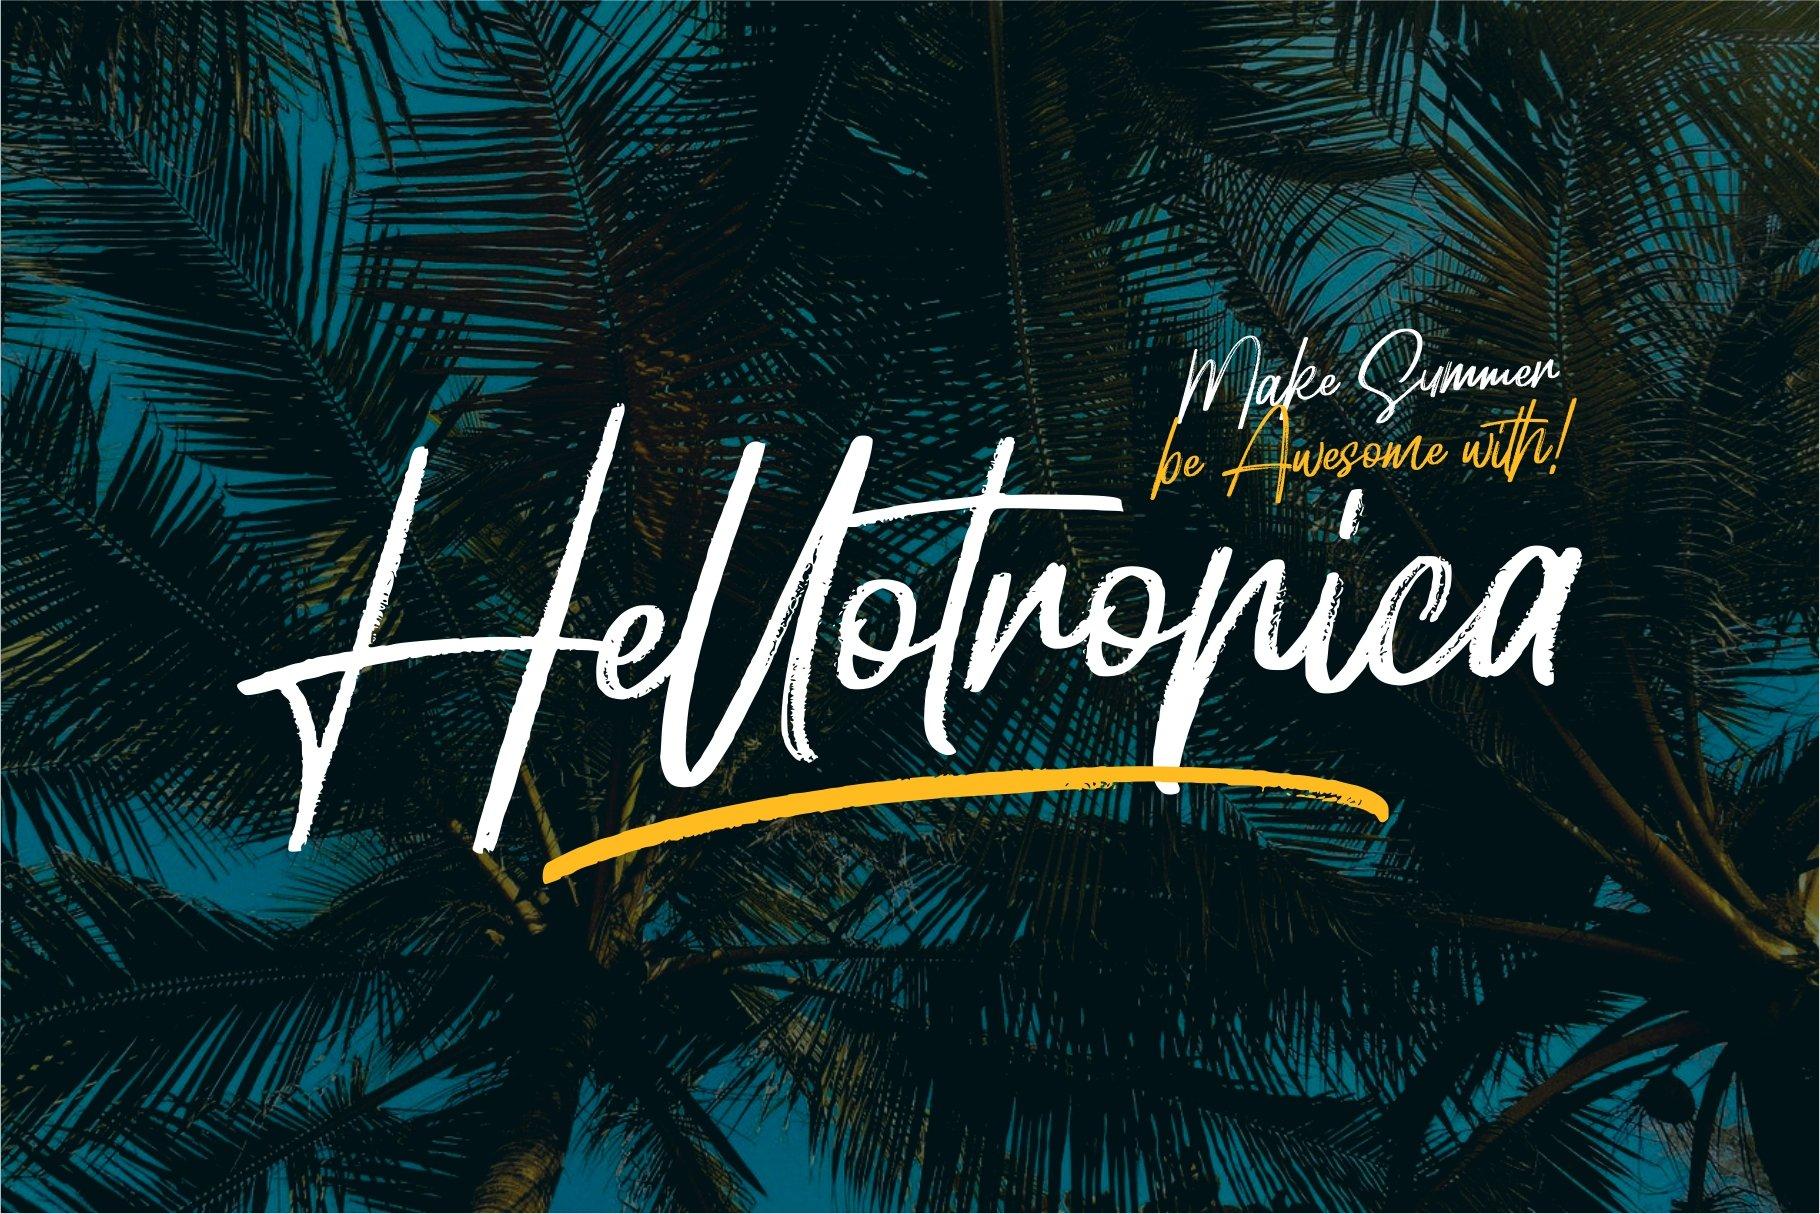 Hellotropica手写笔触书法连笔英文字体下载